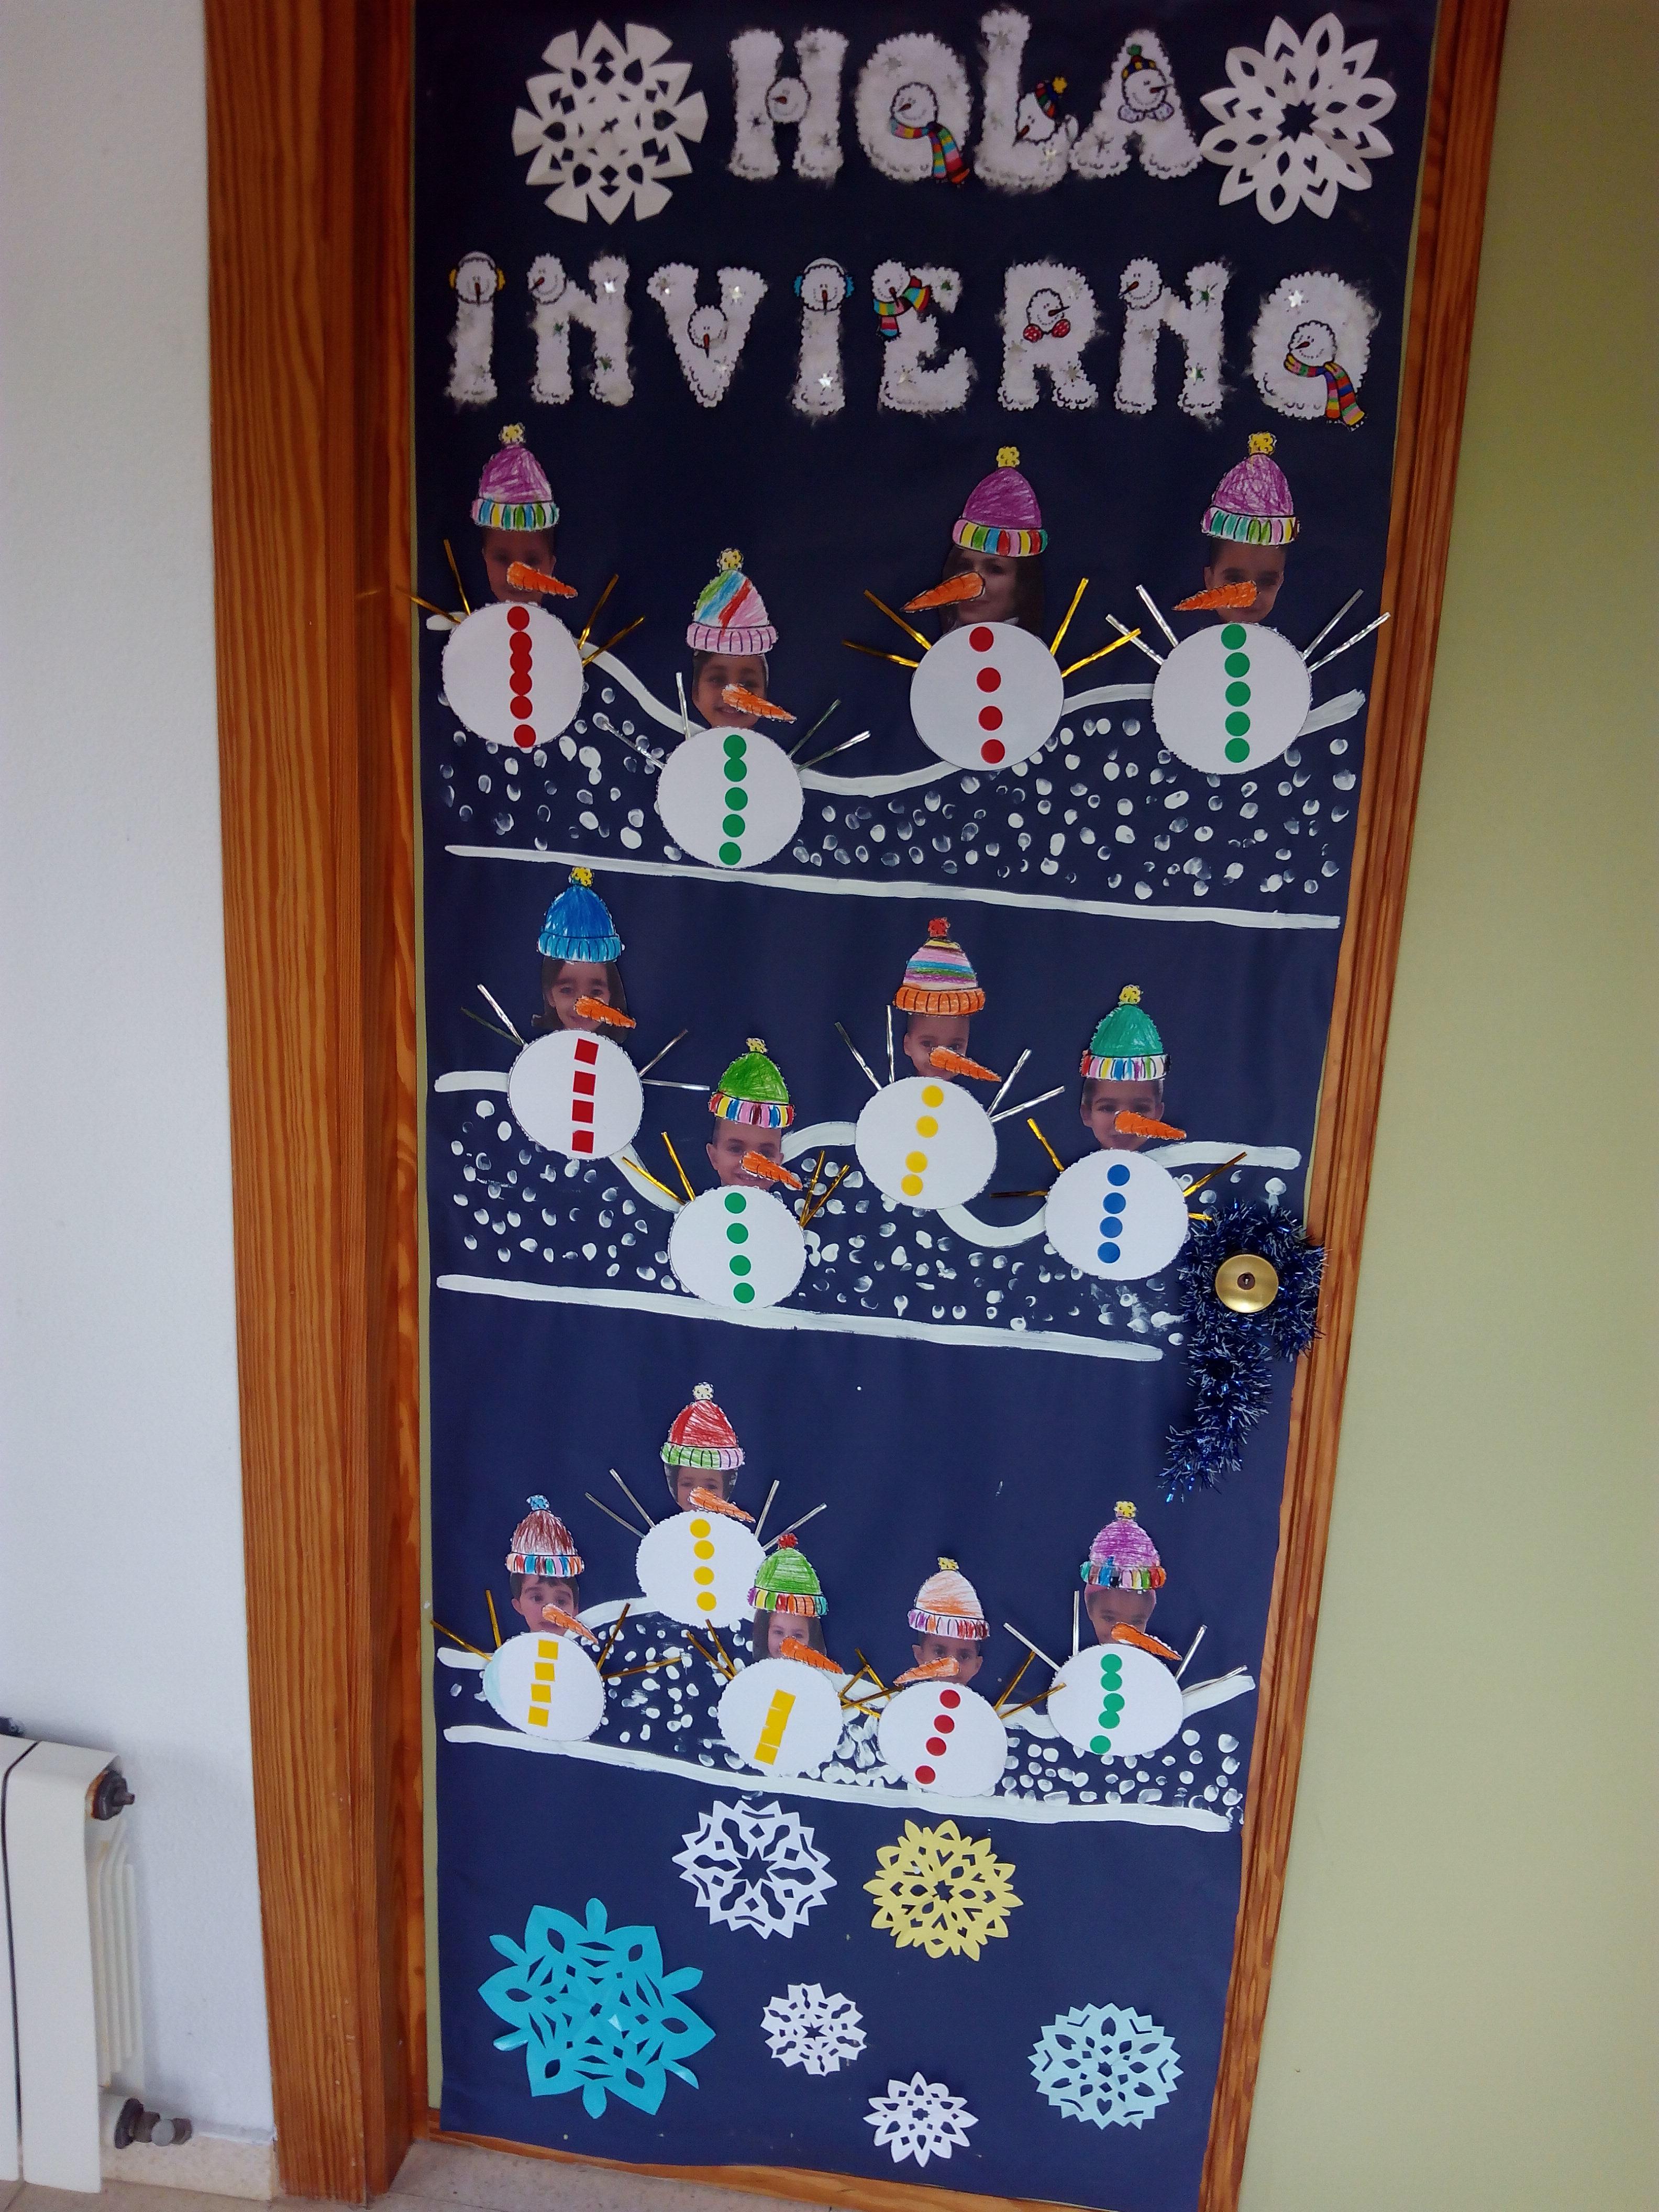 Puertas decoradas el mundo de trixi for Decoracion puerta aula infantil